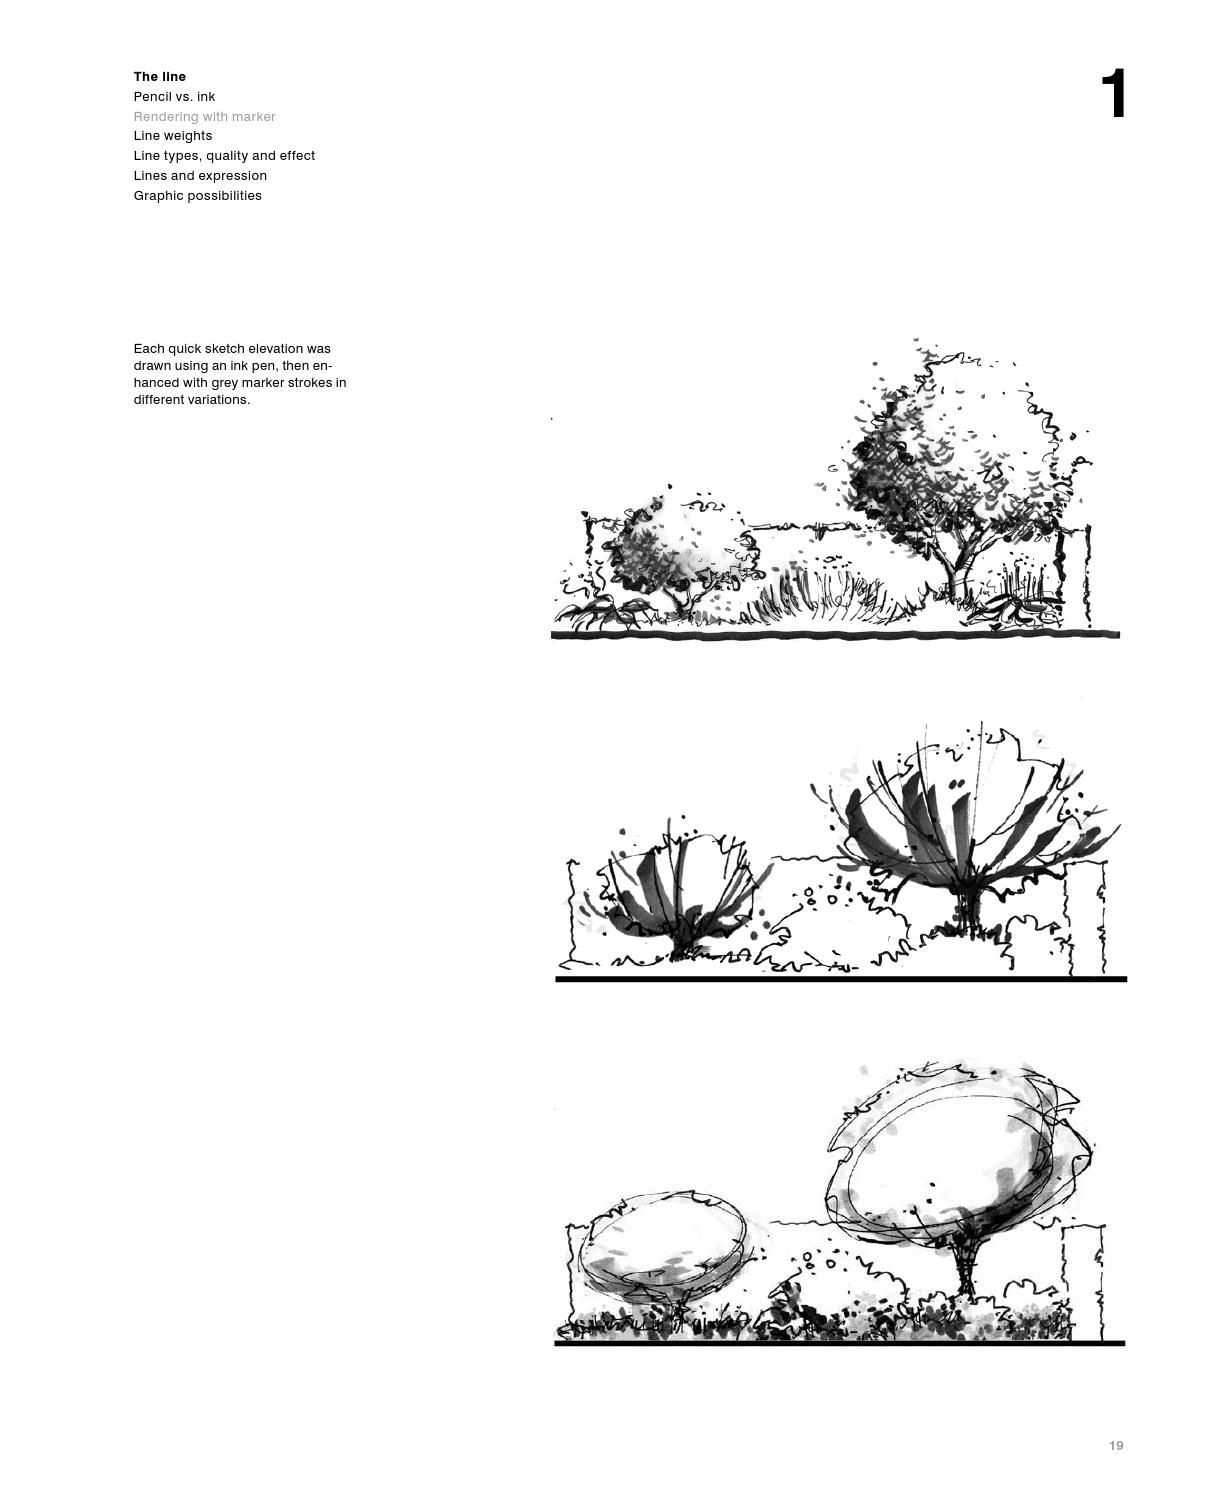 Drawing for landscape architects perspective and drawings drawing for landscape architects by detail issuu buycottarizona Choice Image